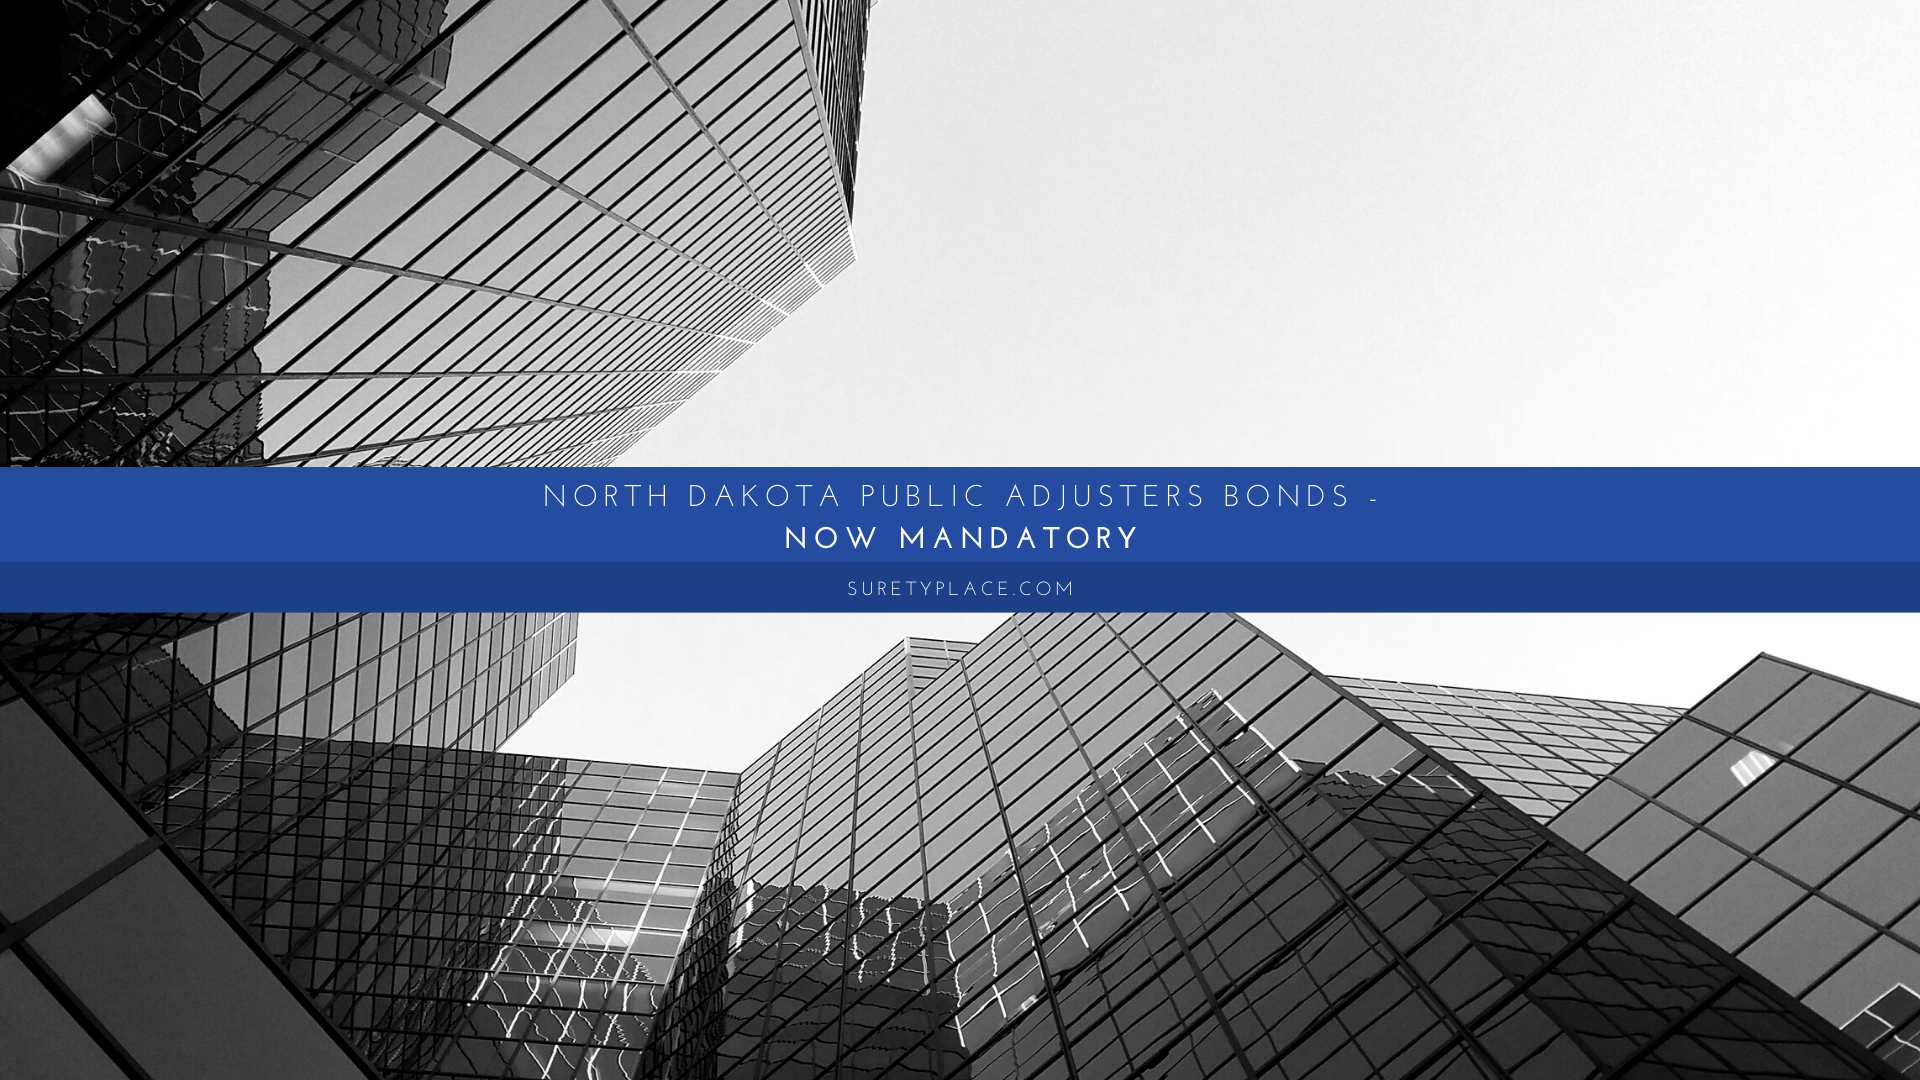 North Dakota Public Adjusters Bonds – Now Mandatory